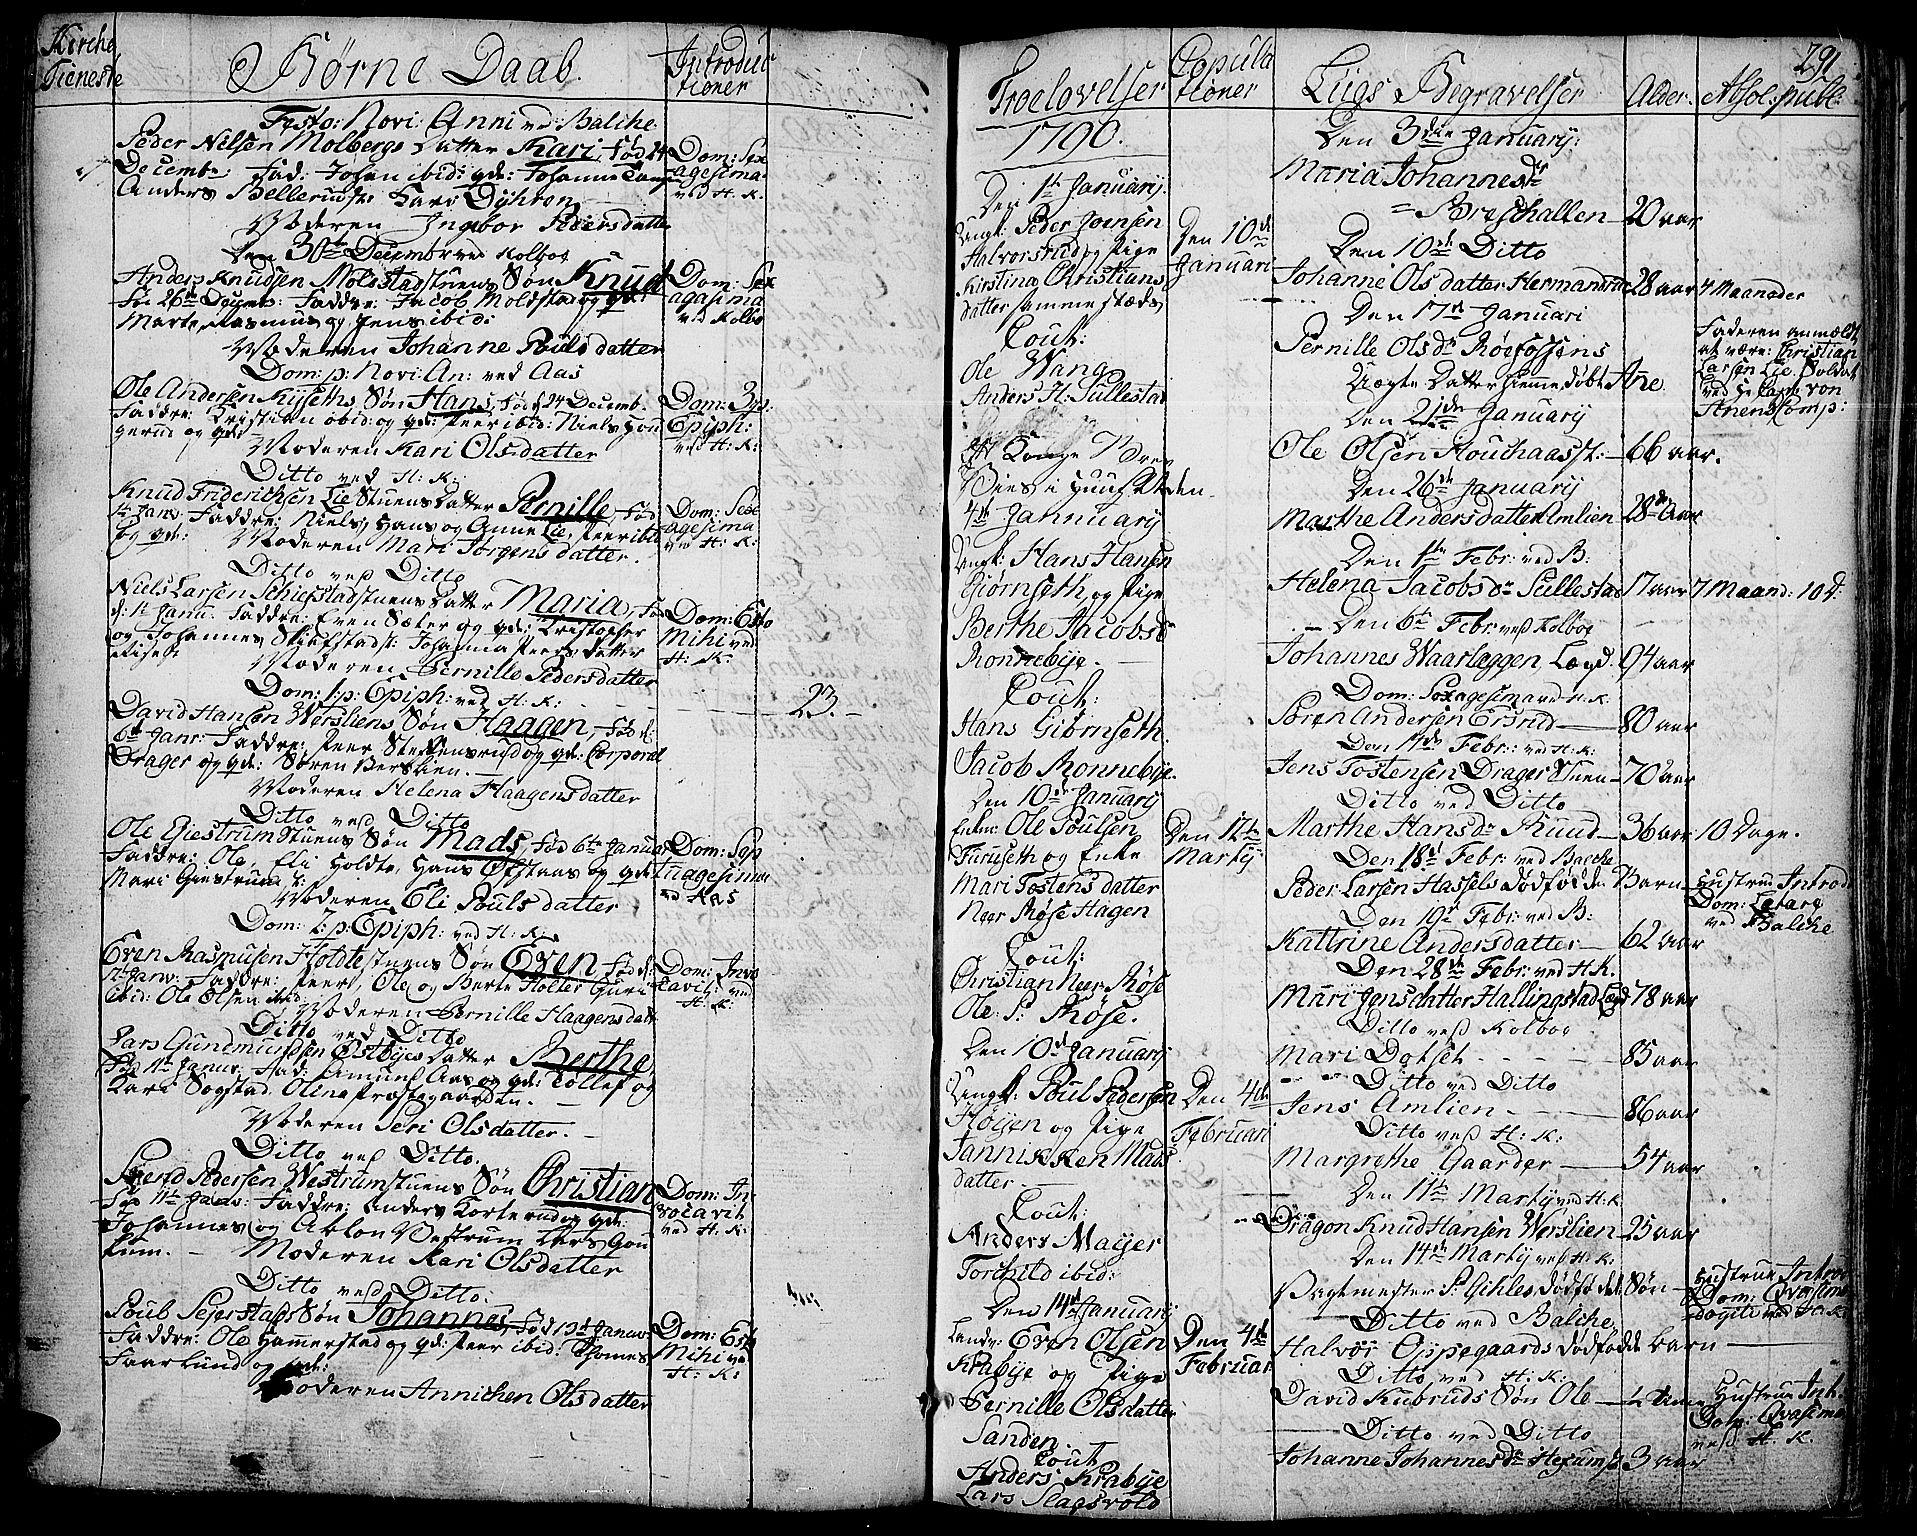 SAH, Toten prestekontor, Ministerialbok nr. 6, 1773-1793, s. 291